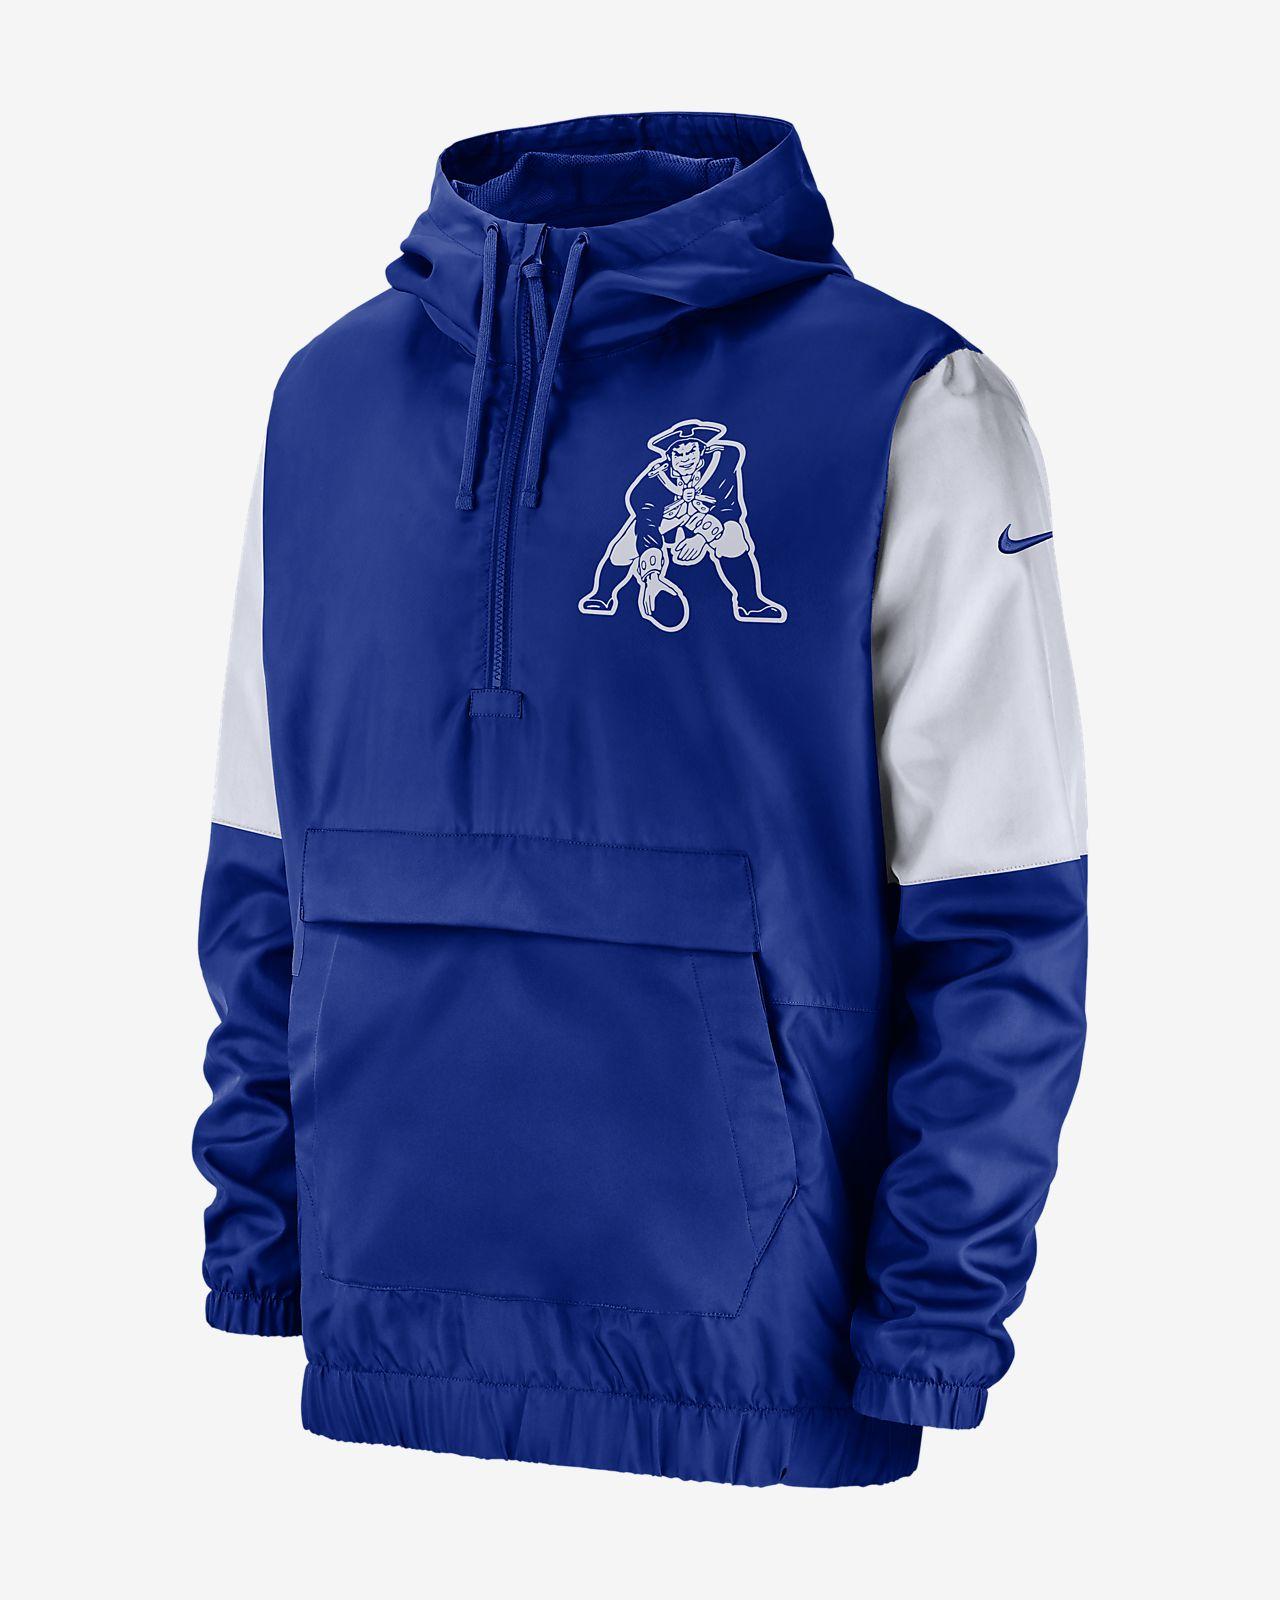 Nike Anorak (NFL Patriots) Men's Jacket